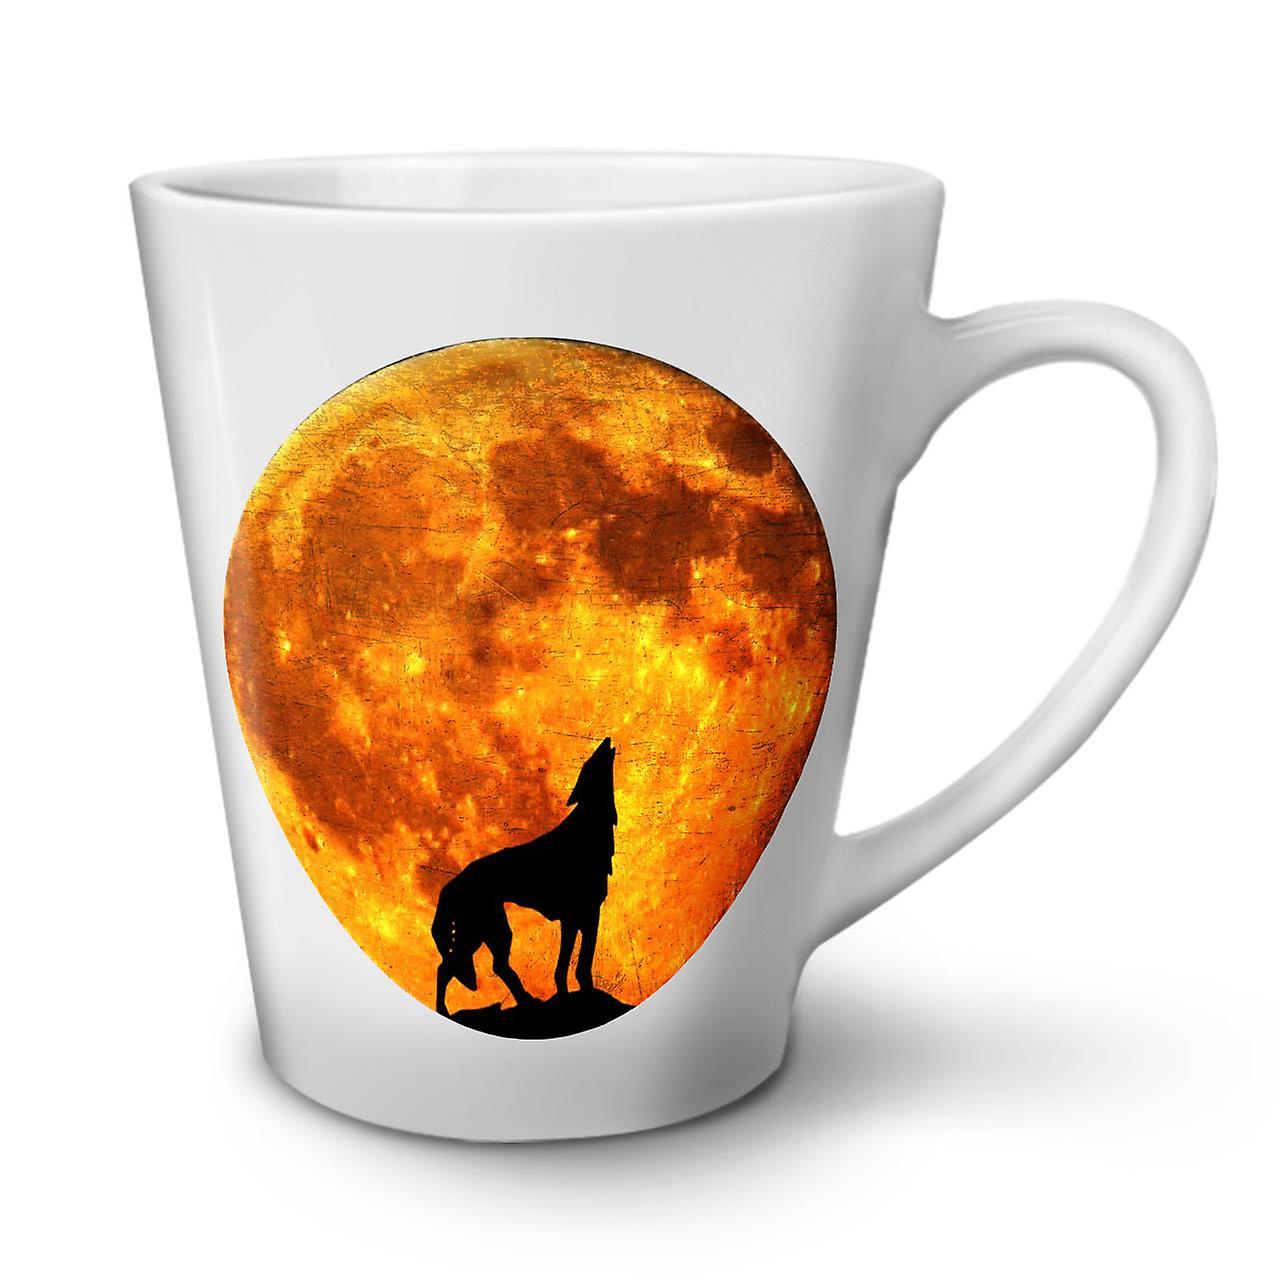 Wolf Nature Animal En Latte Nouvelle 12 Moon Tasse Café Blanche OzWellcoda Céramique Yb76gyvf